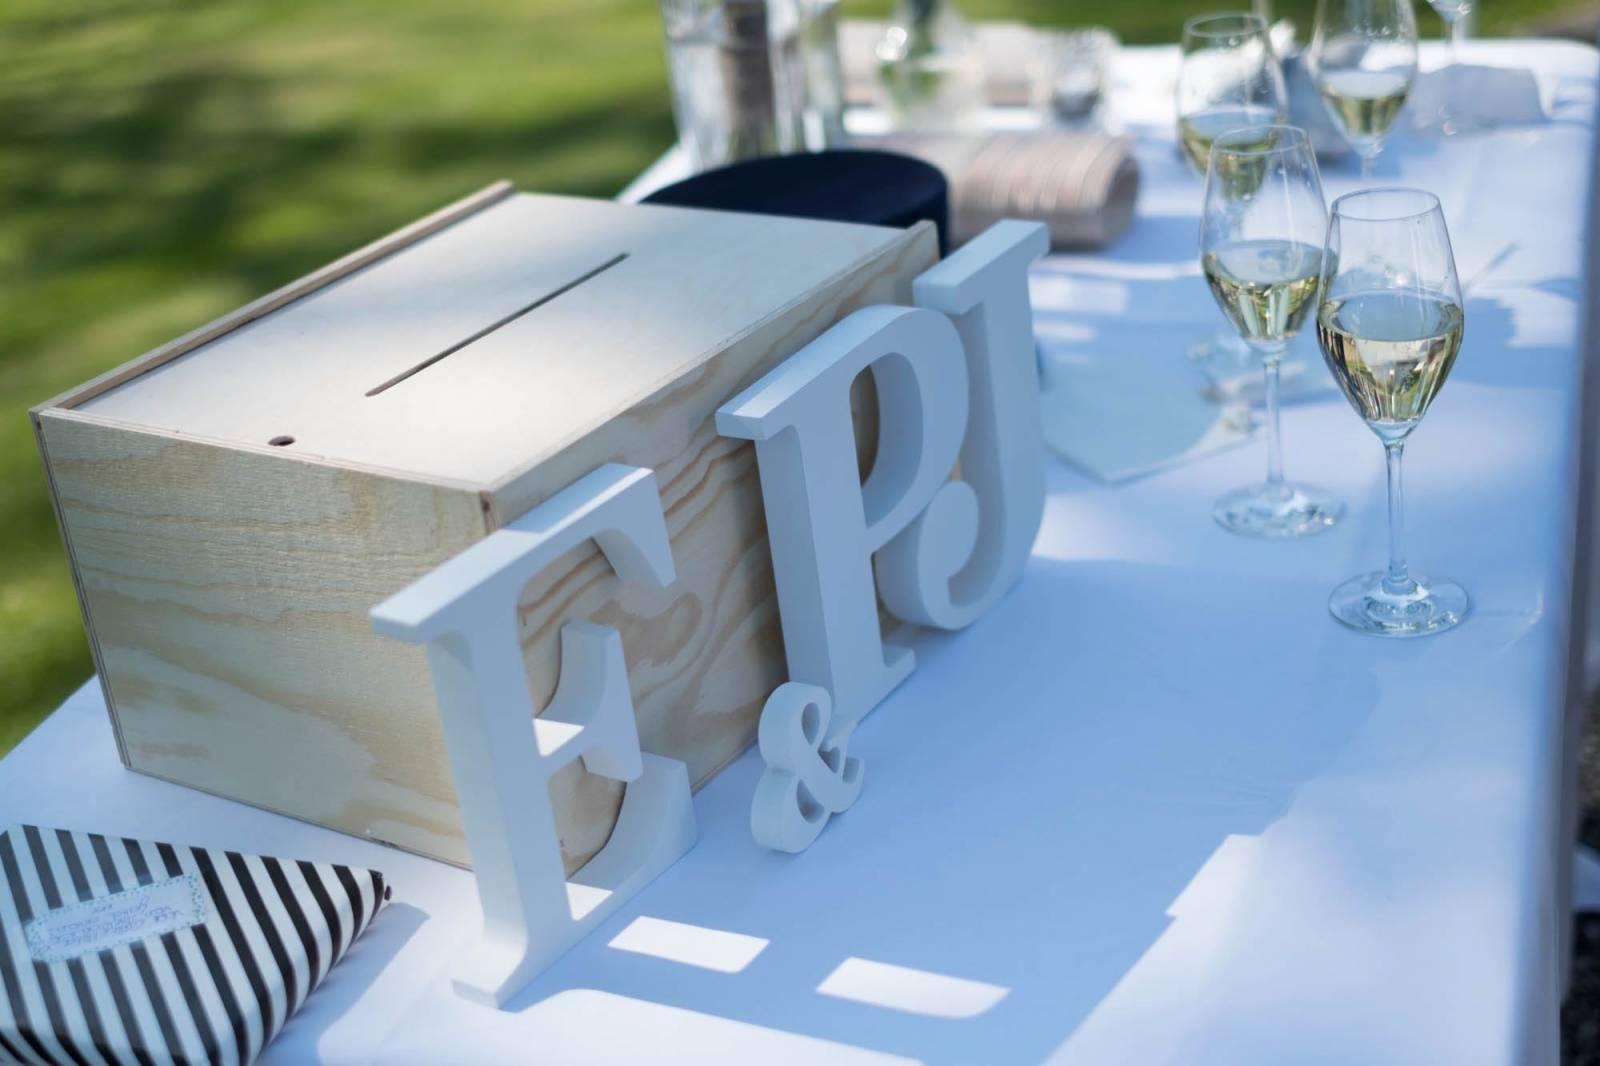 Lamont Ceremonie - Ceremonie - Fotograaf Fotografie Decleck Mario - House of Weddings - 2